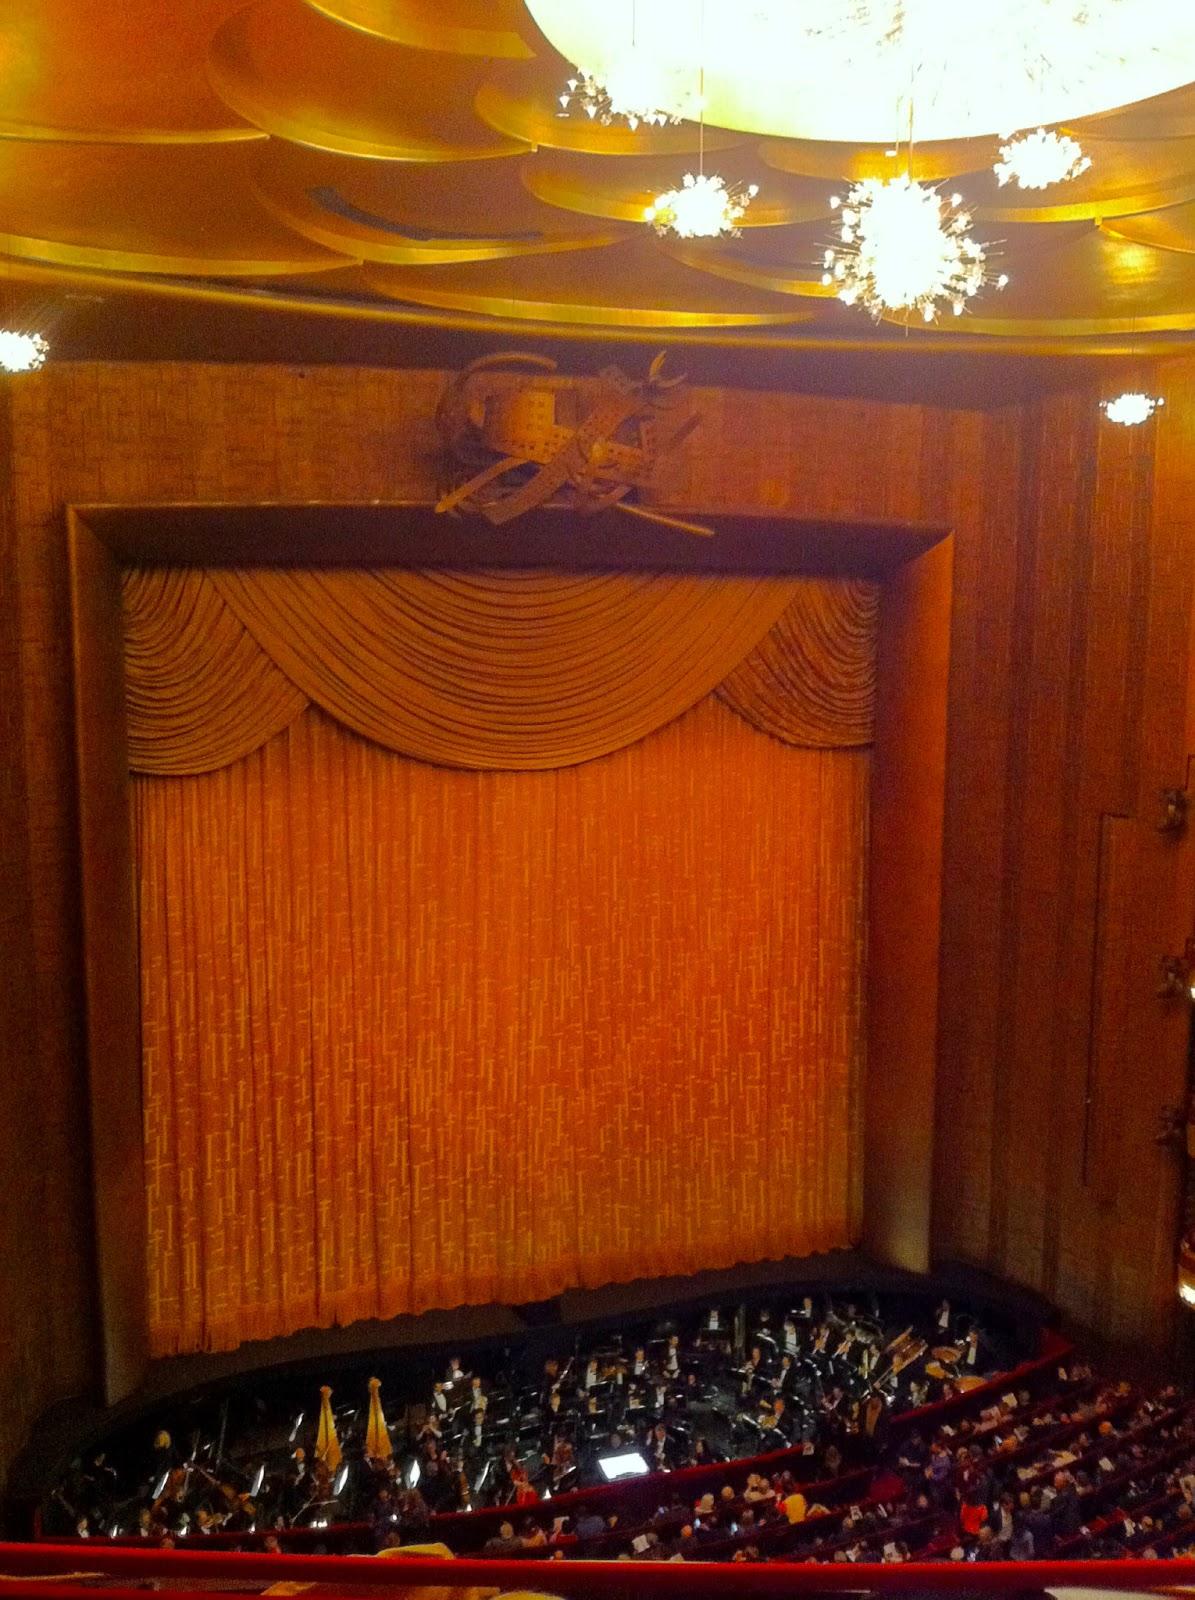 Bart Boehlerts Beautiful Things Opera Outing Turandot at the Met